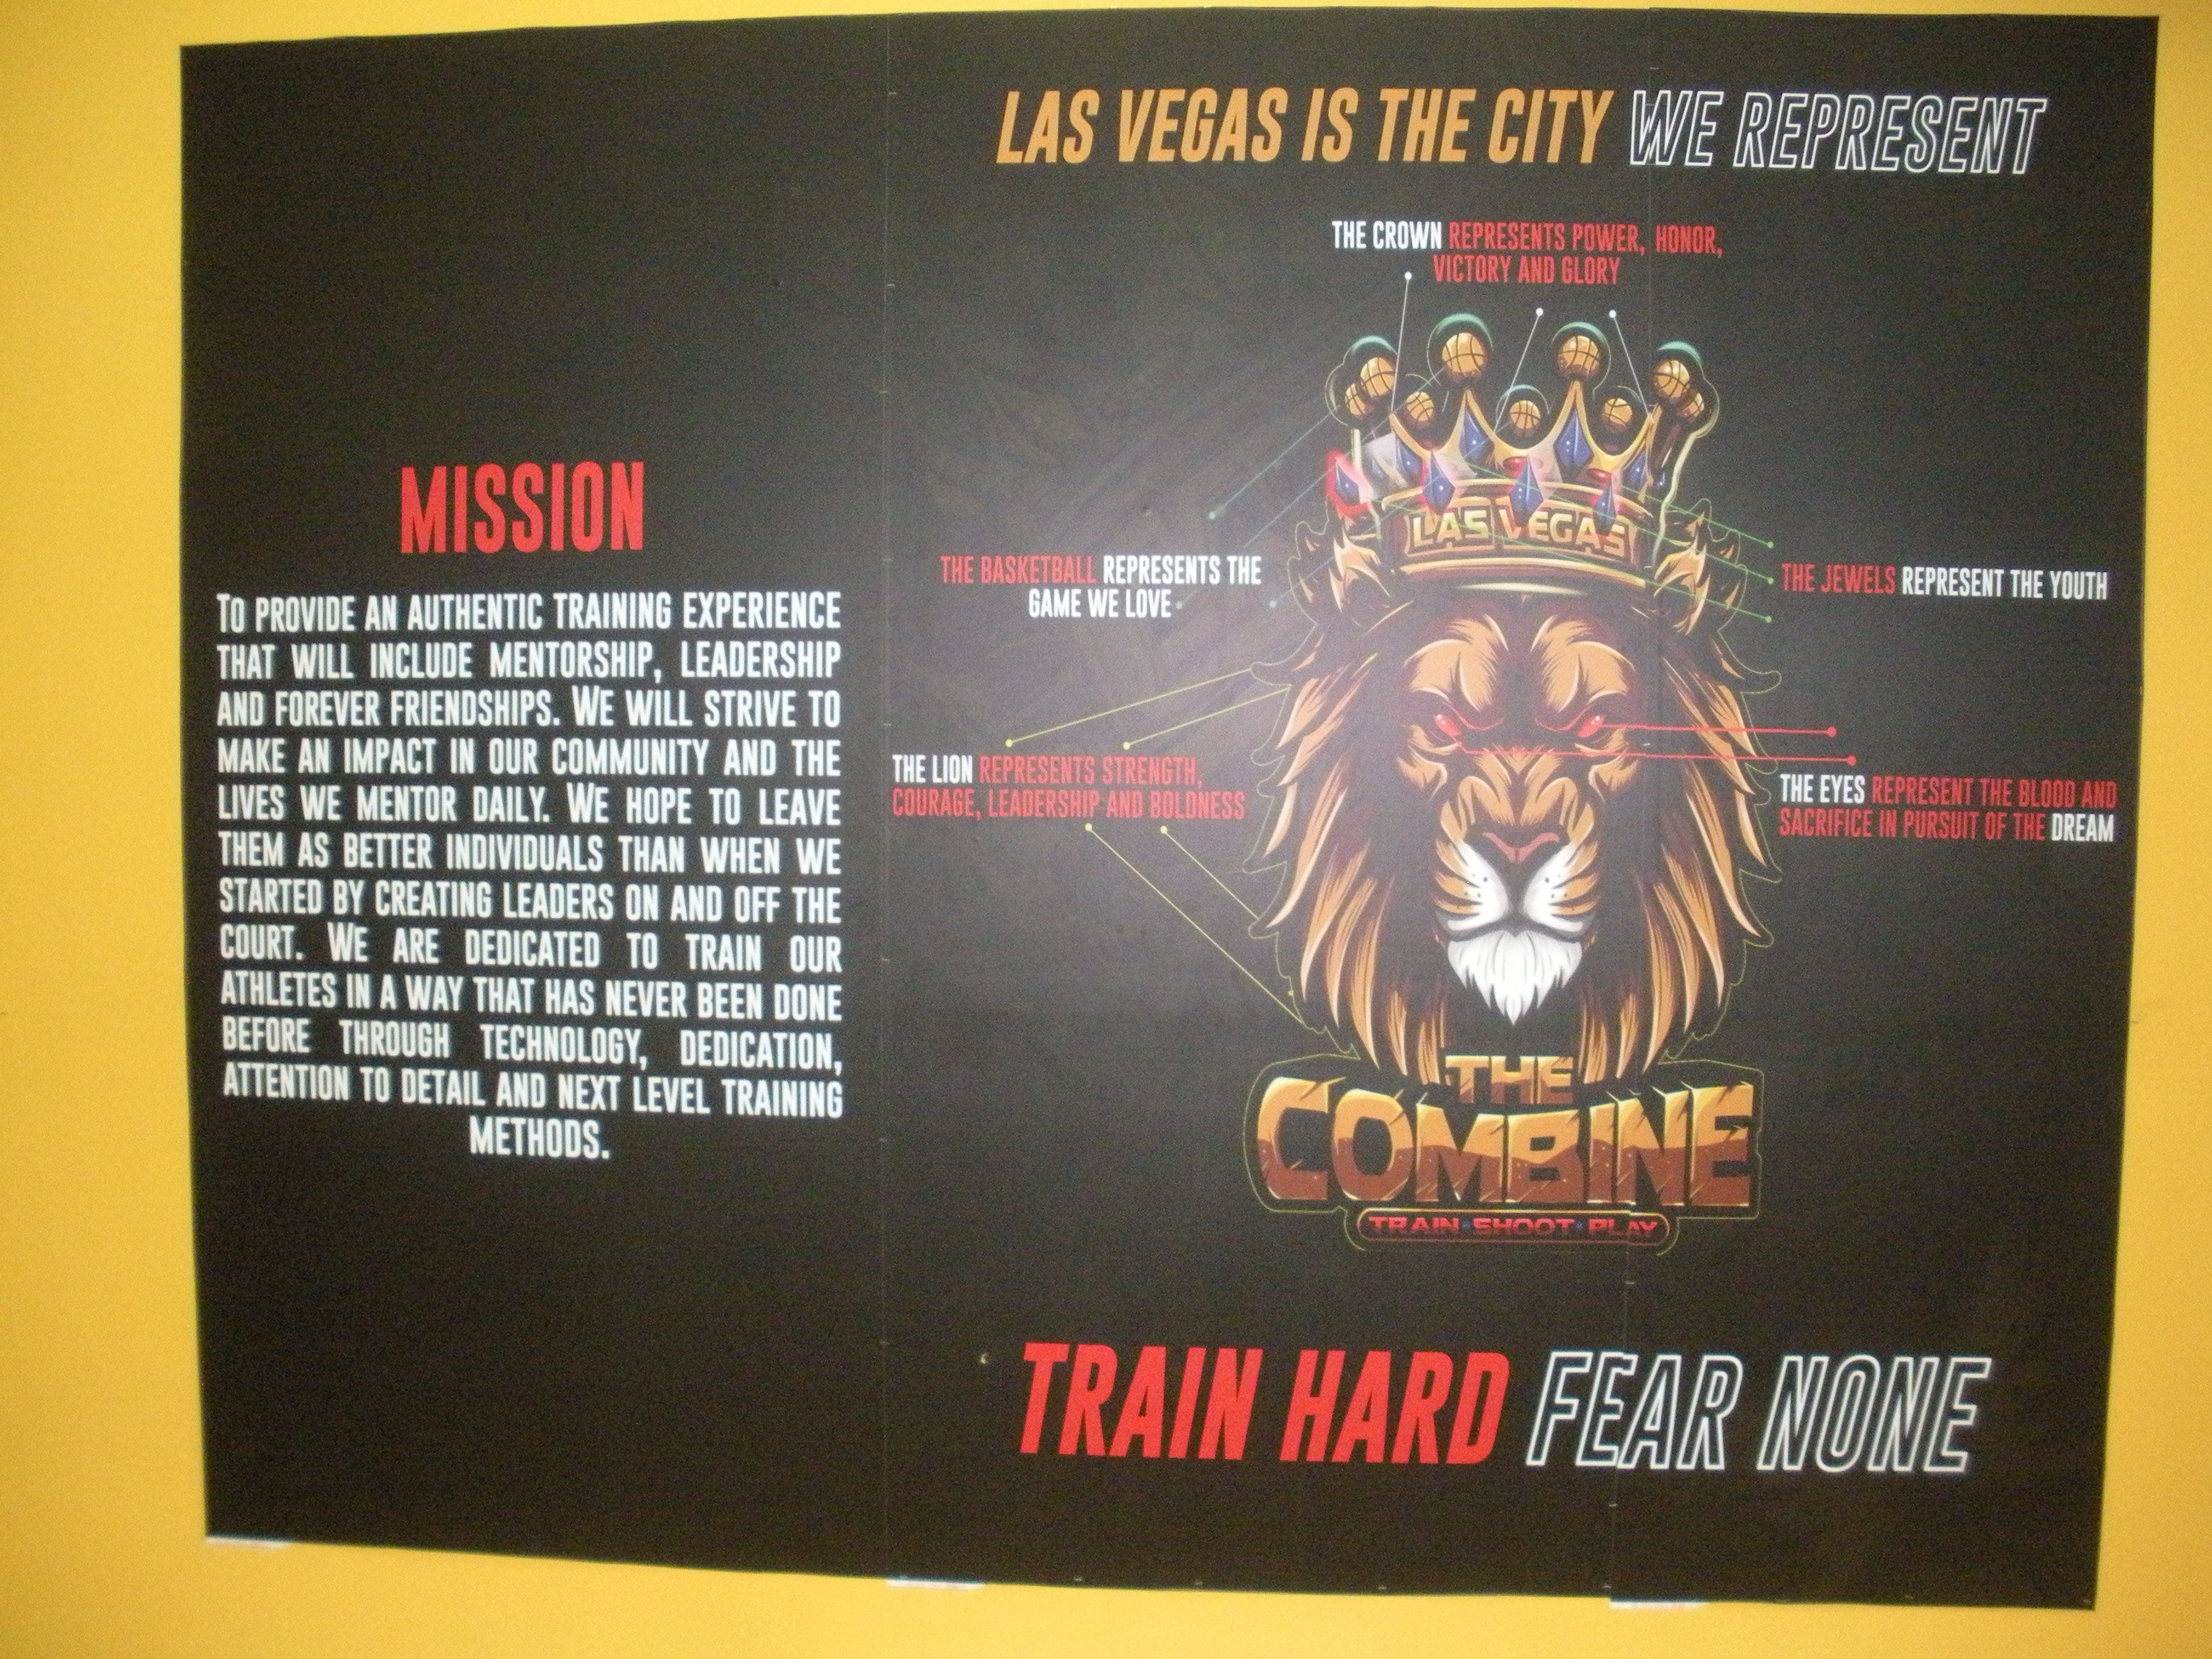 The Combine LLC